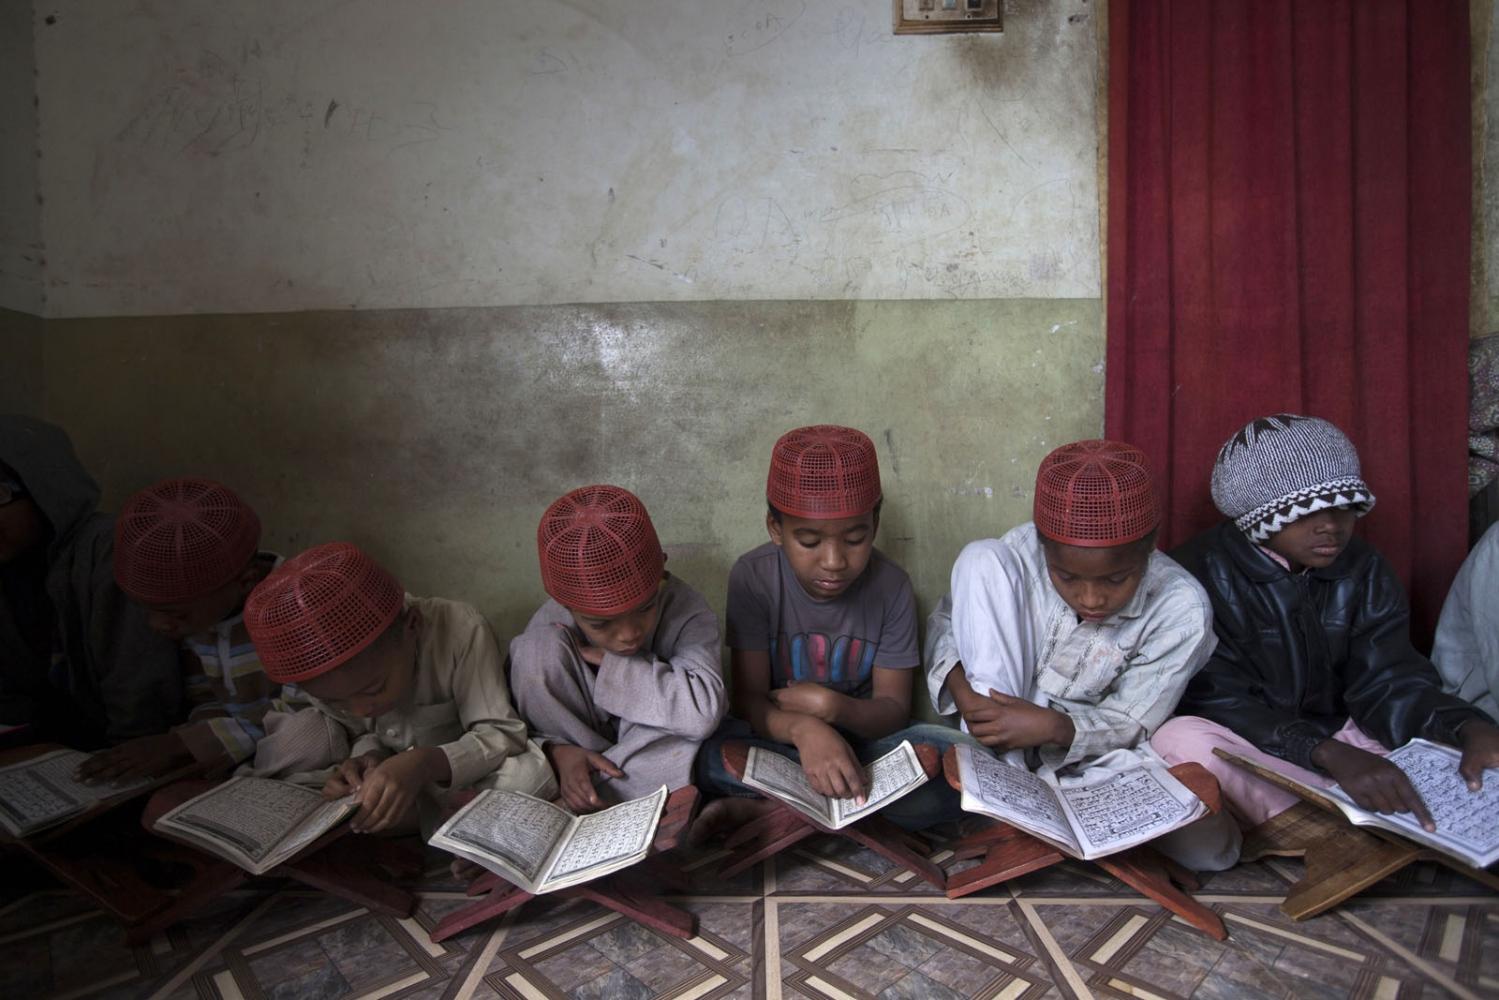 Art and Documentary Photography - Loading Sidi_SouthAsia14.JPG